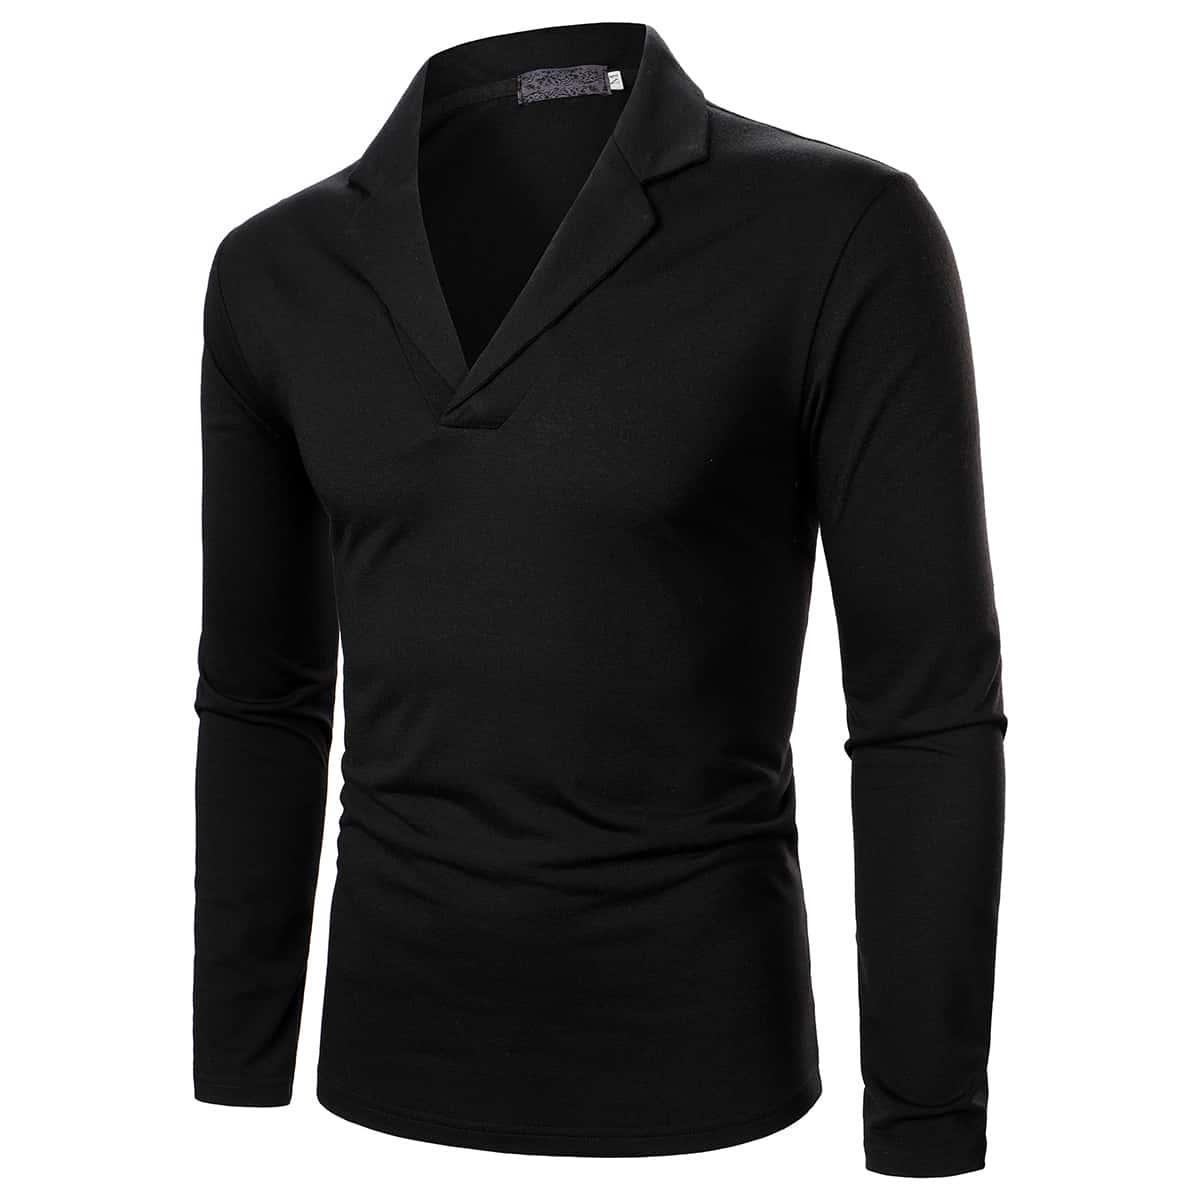 Мужская рубашка-поло с лацканами